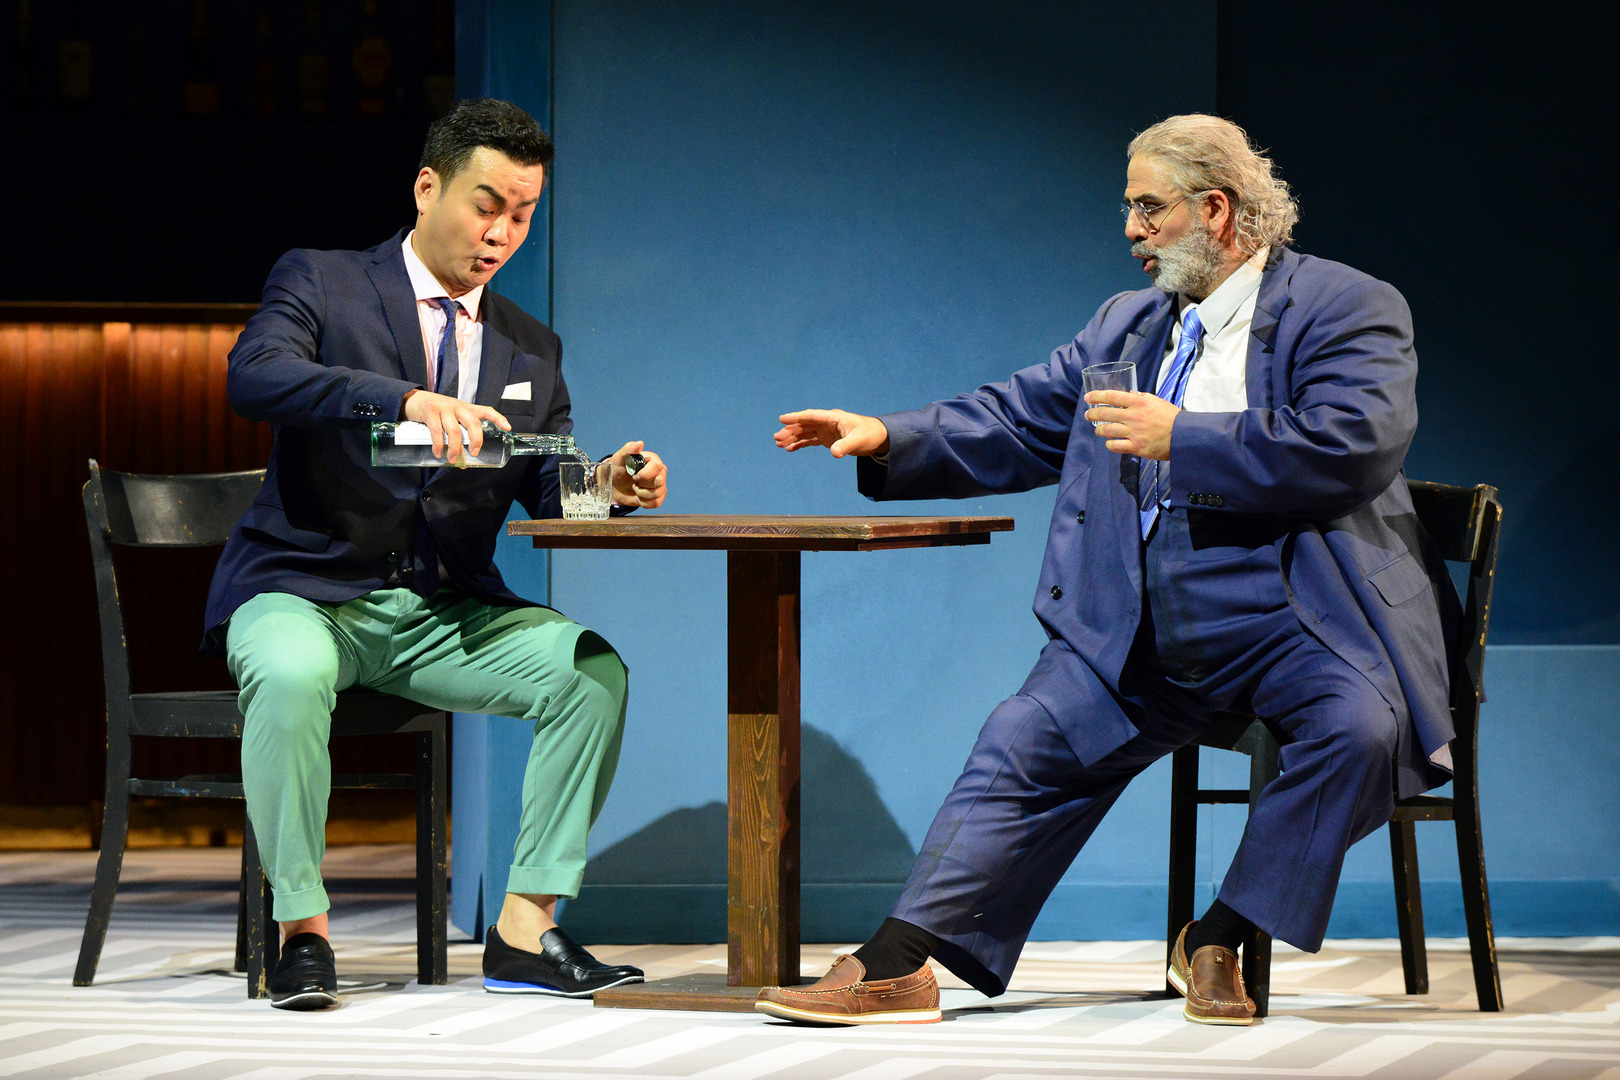 Falstaff-Opera-by-Giuseppe-Verdi-directed-by-Jacopo-Spirei- in-Karlsruhe-2